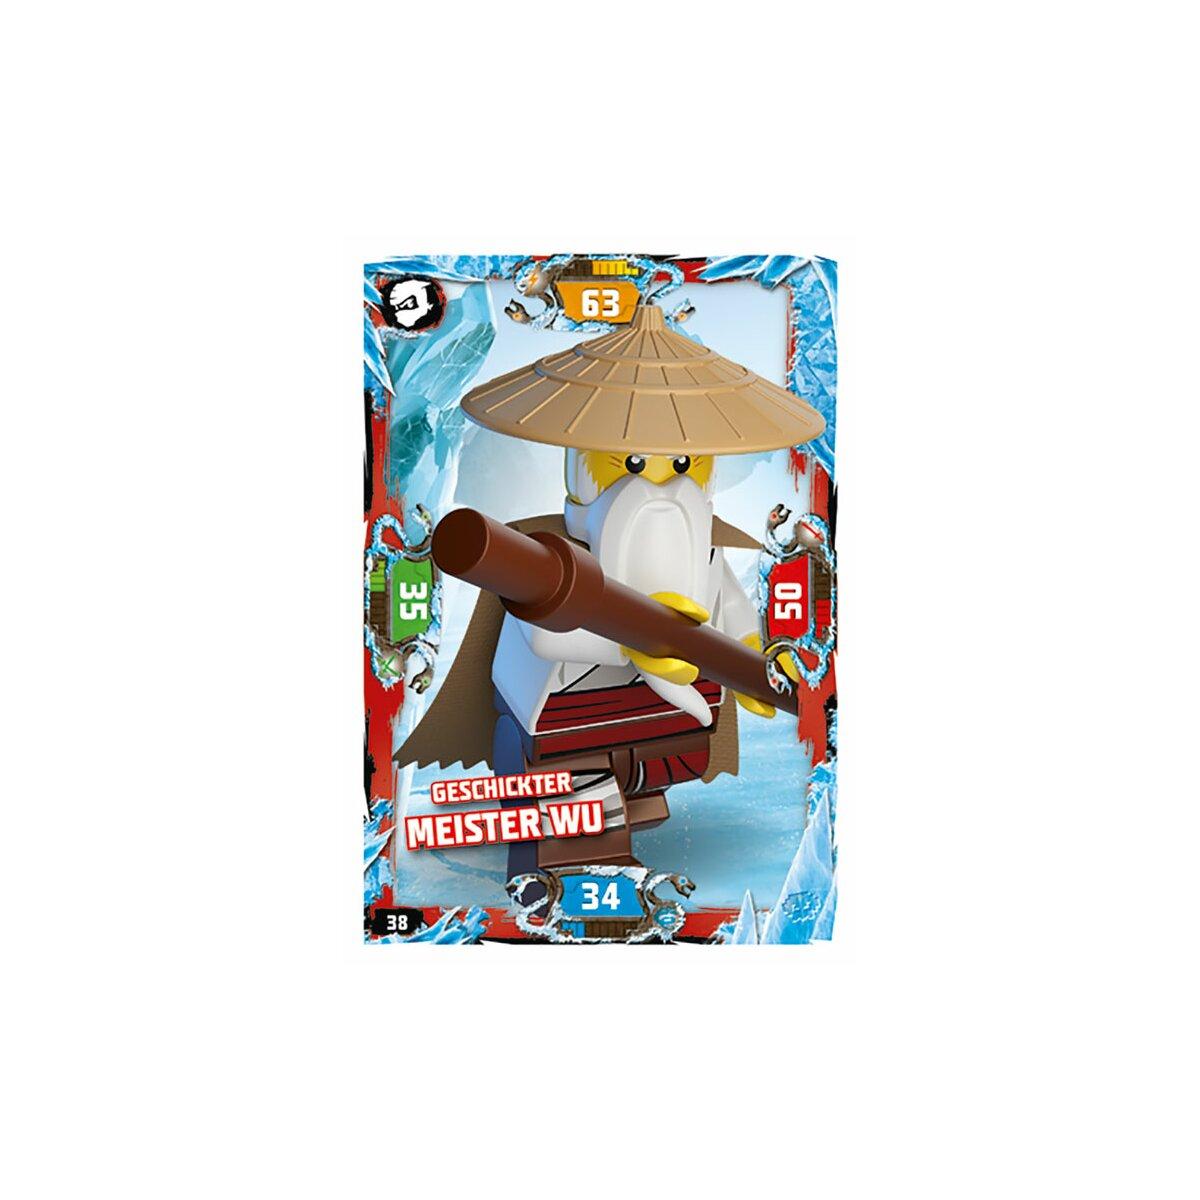 Meister Wu